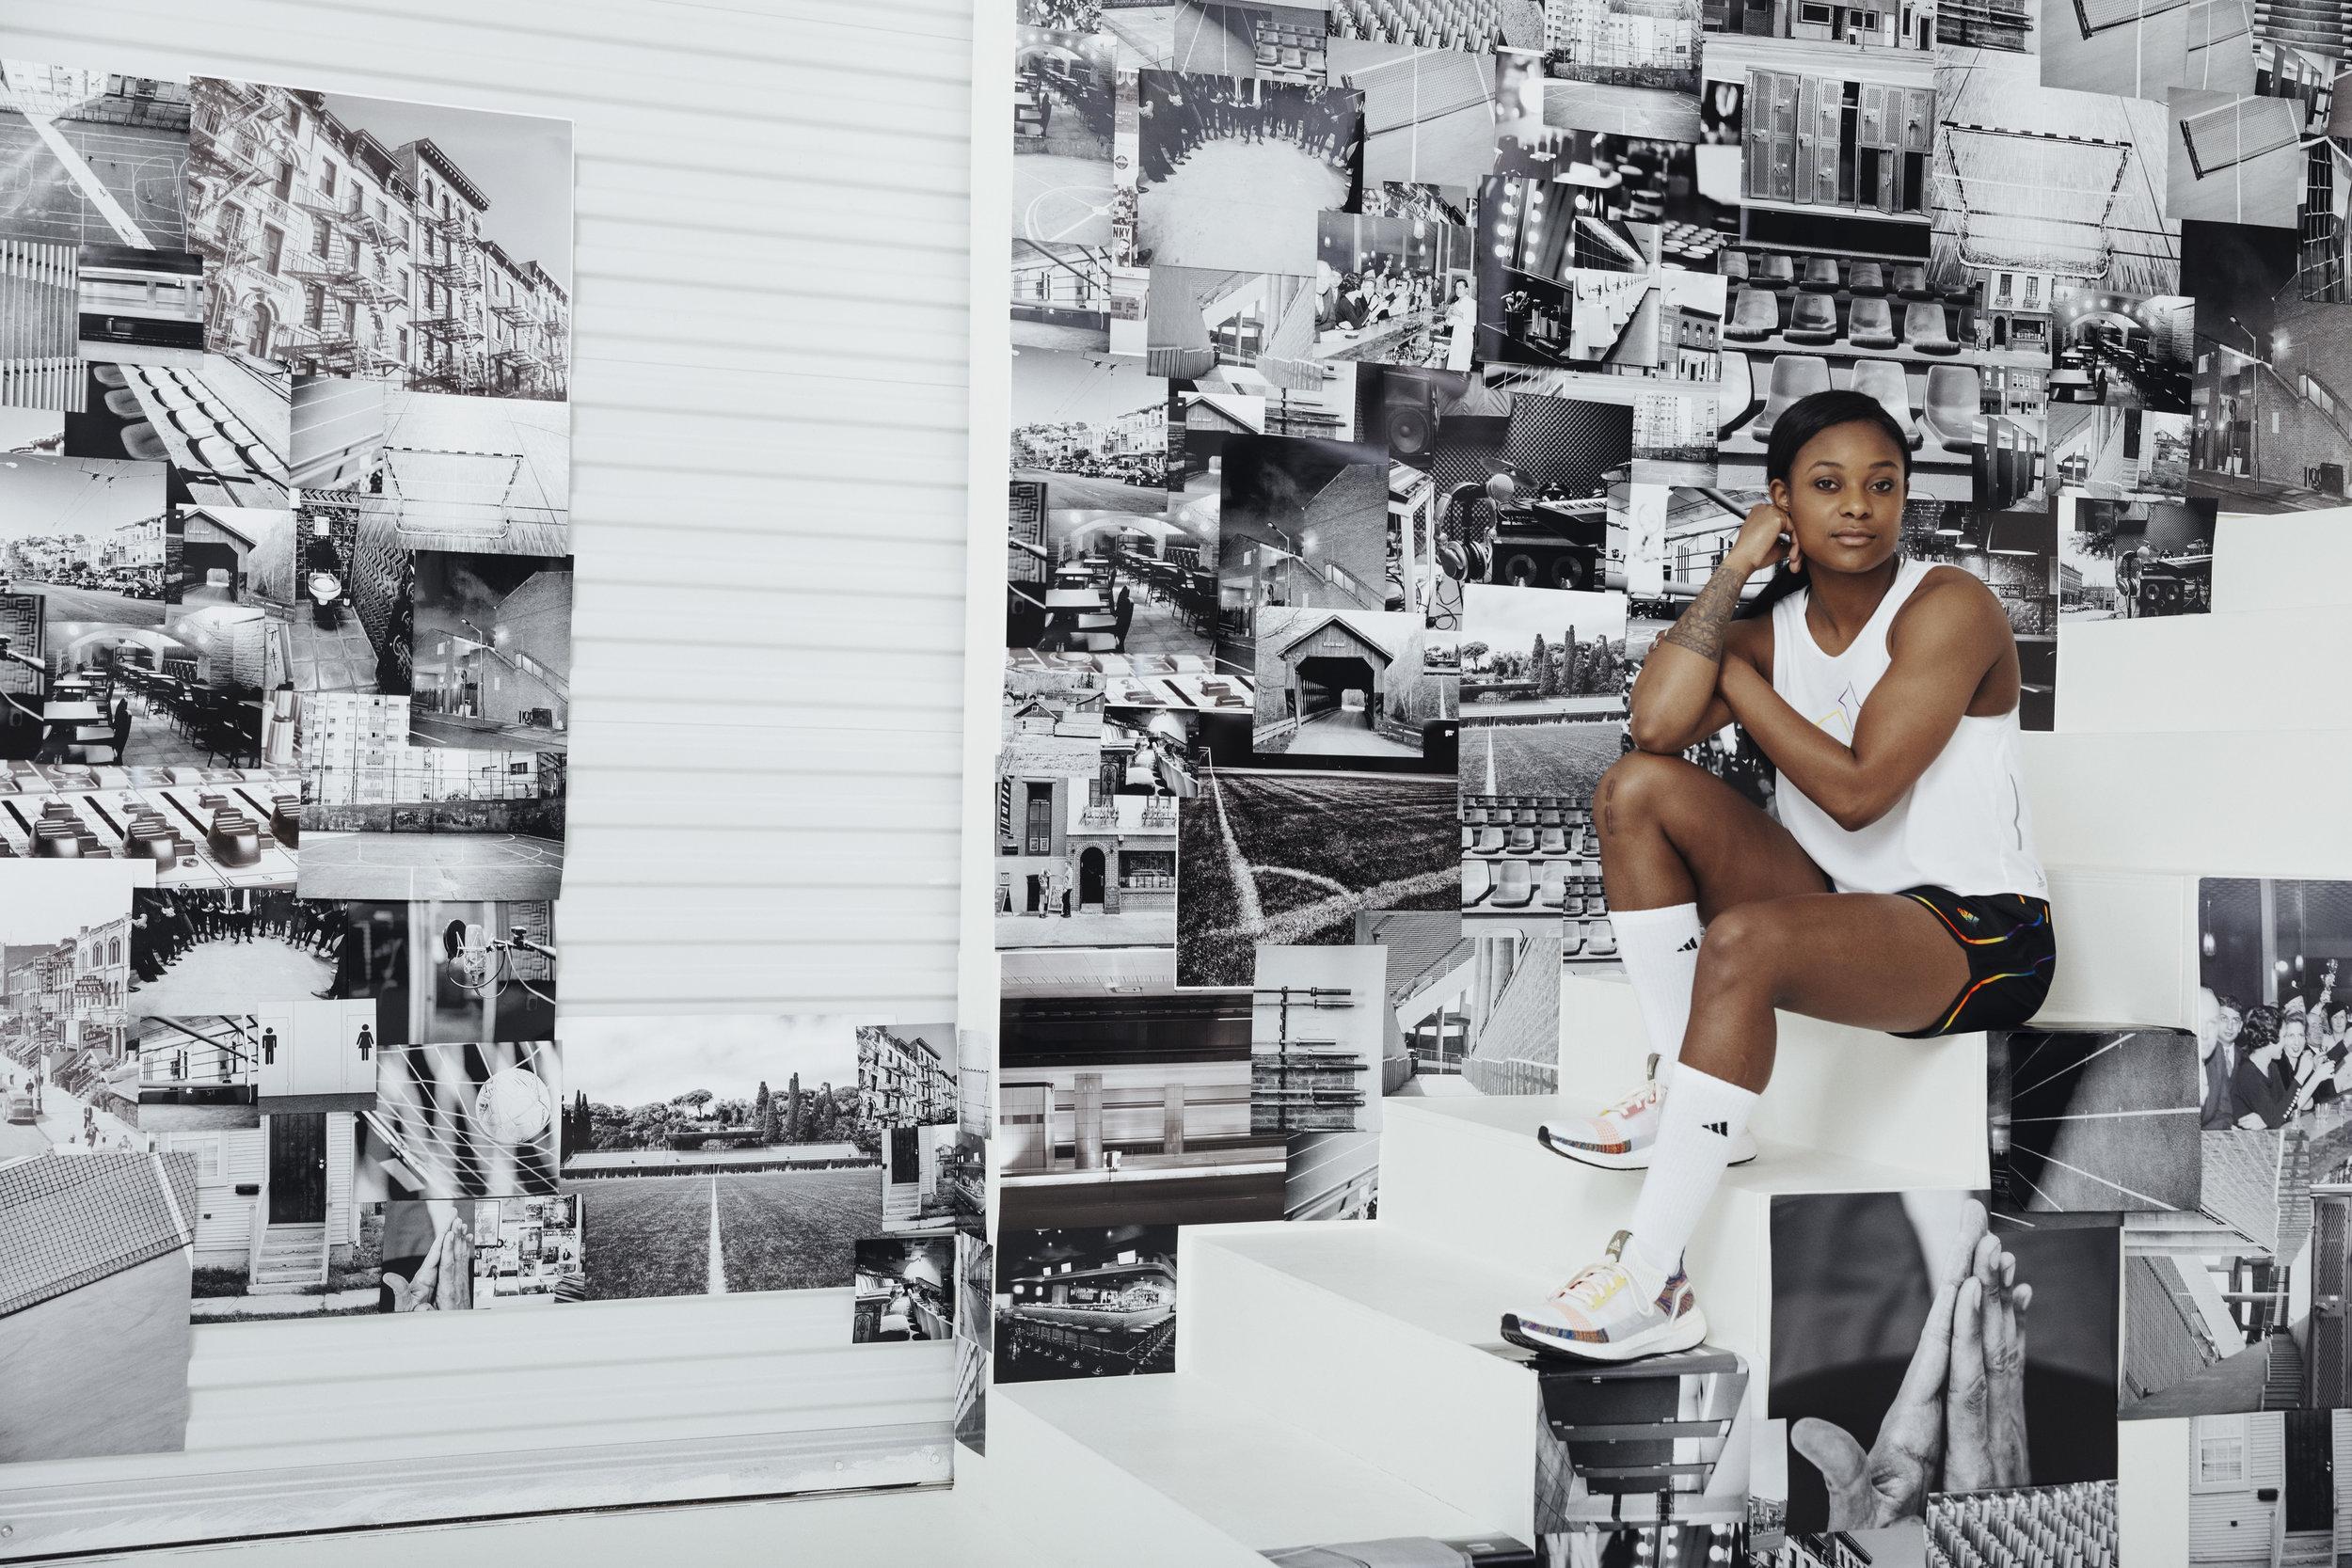 adidas_pride_love_unites_by_gia_goodrich_lesbian_artist_activist_Shot_04_Taylor_Lk_02_&_03_00895.jpg